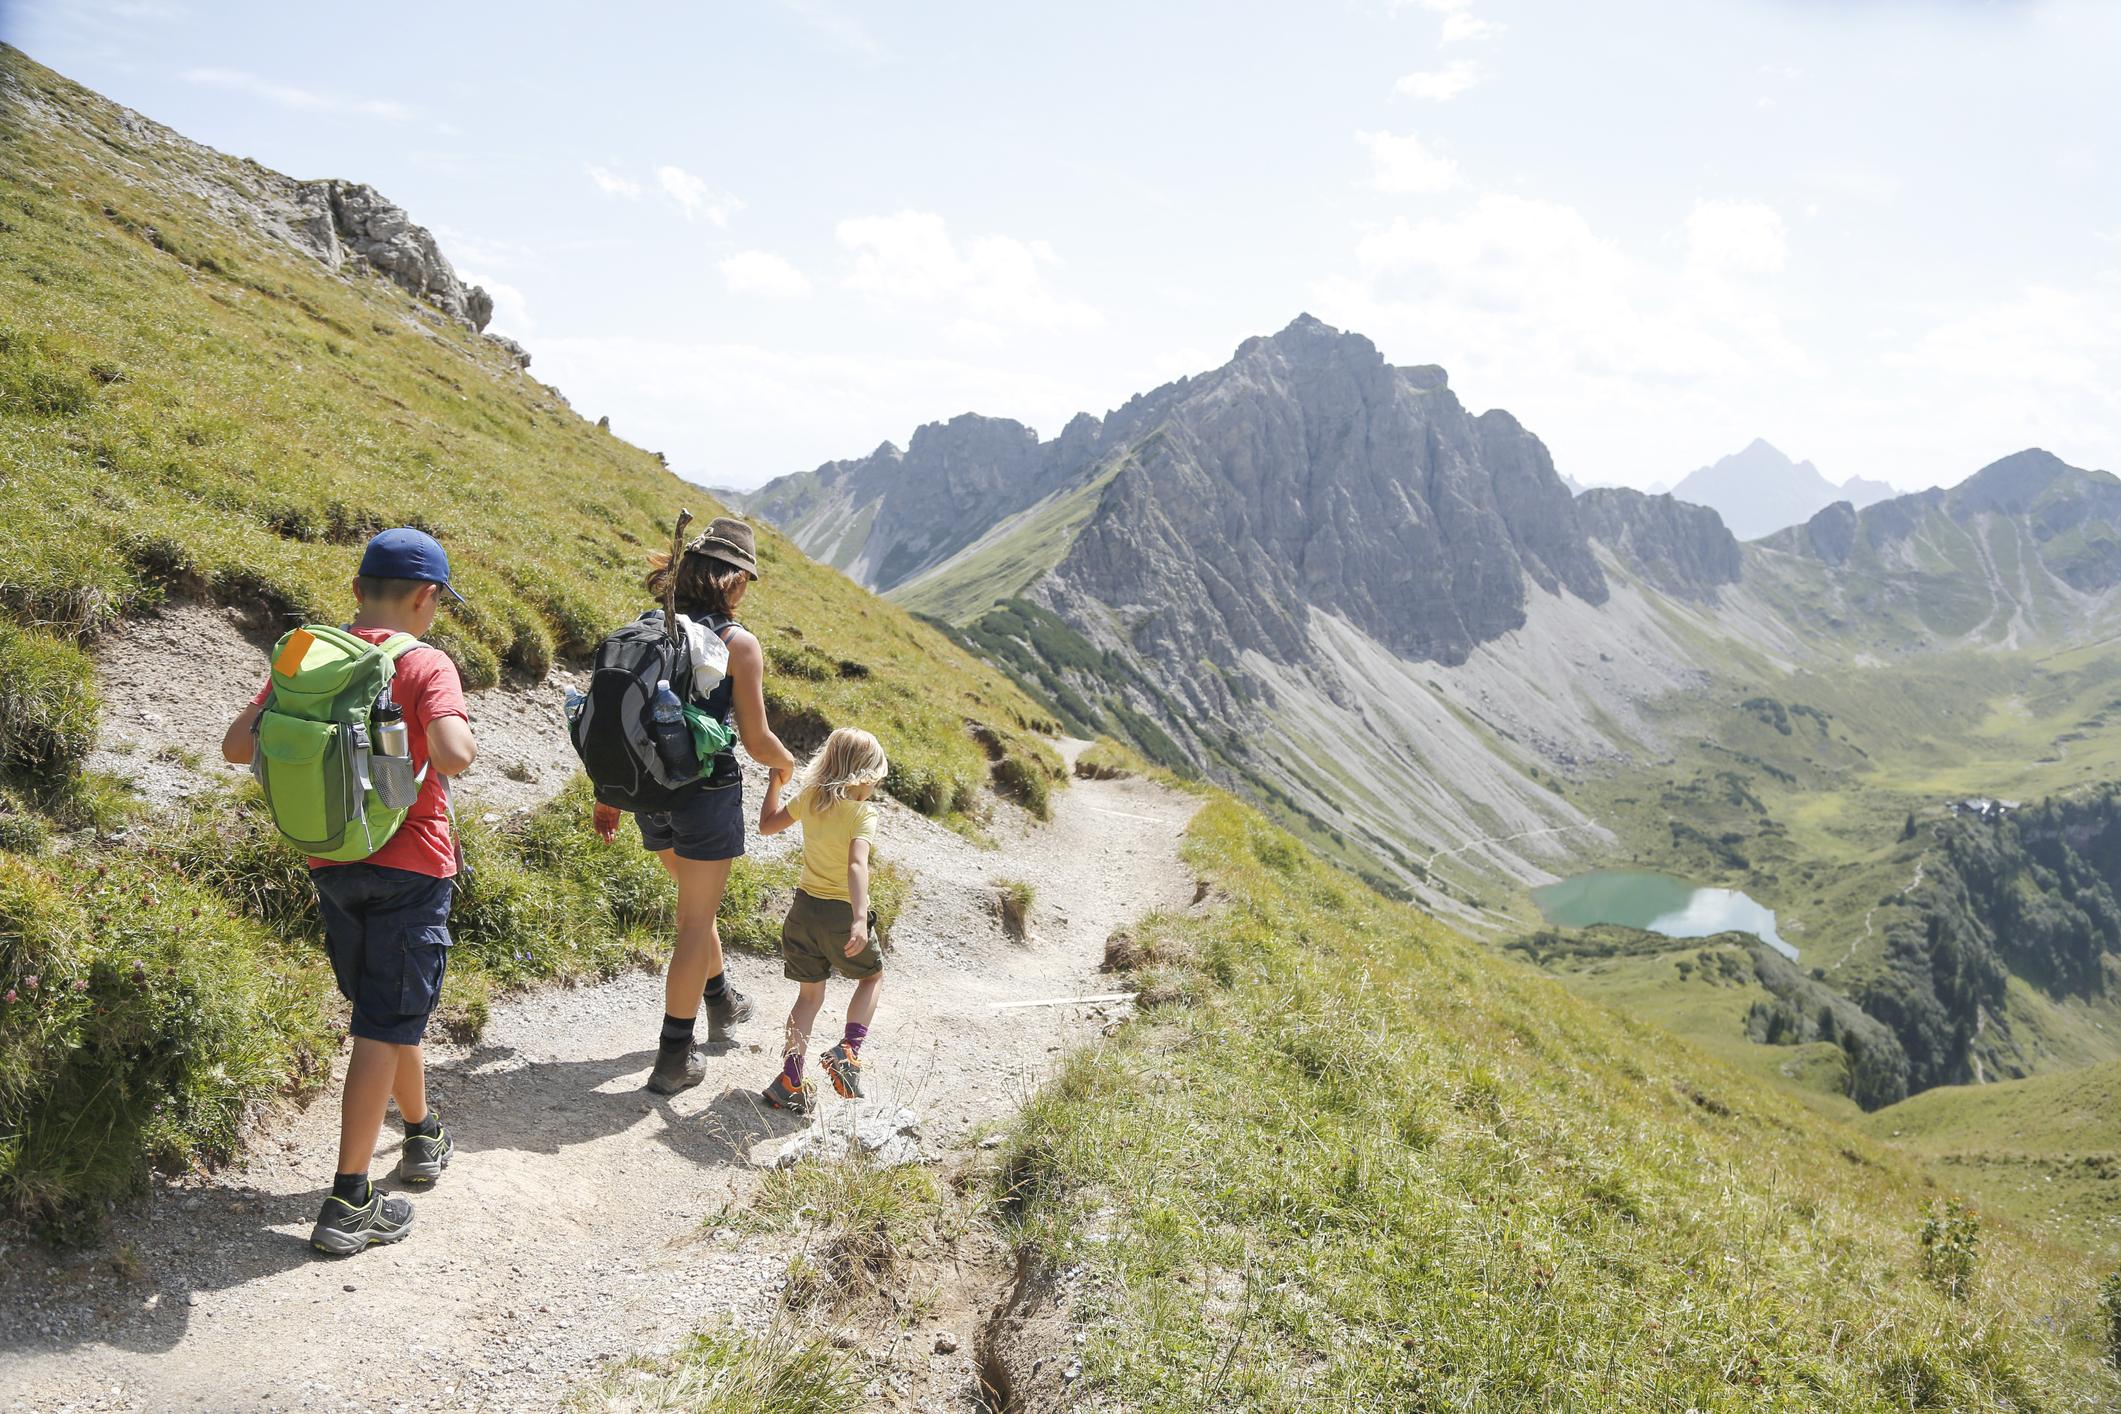 Austria, South Tyrol, family hiking